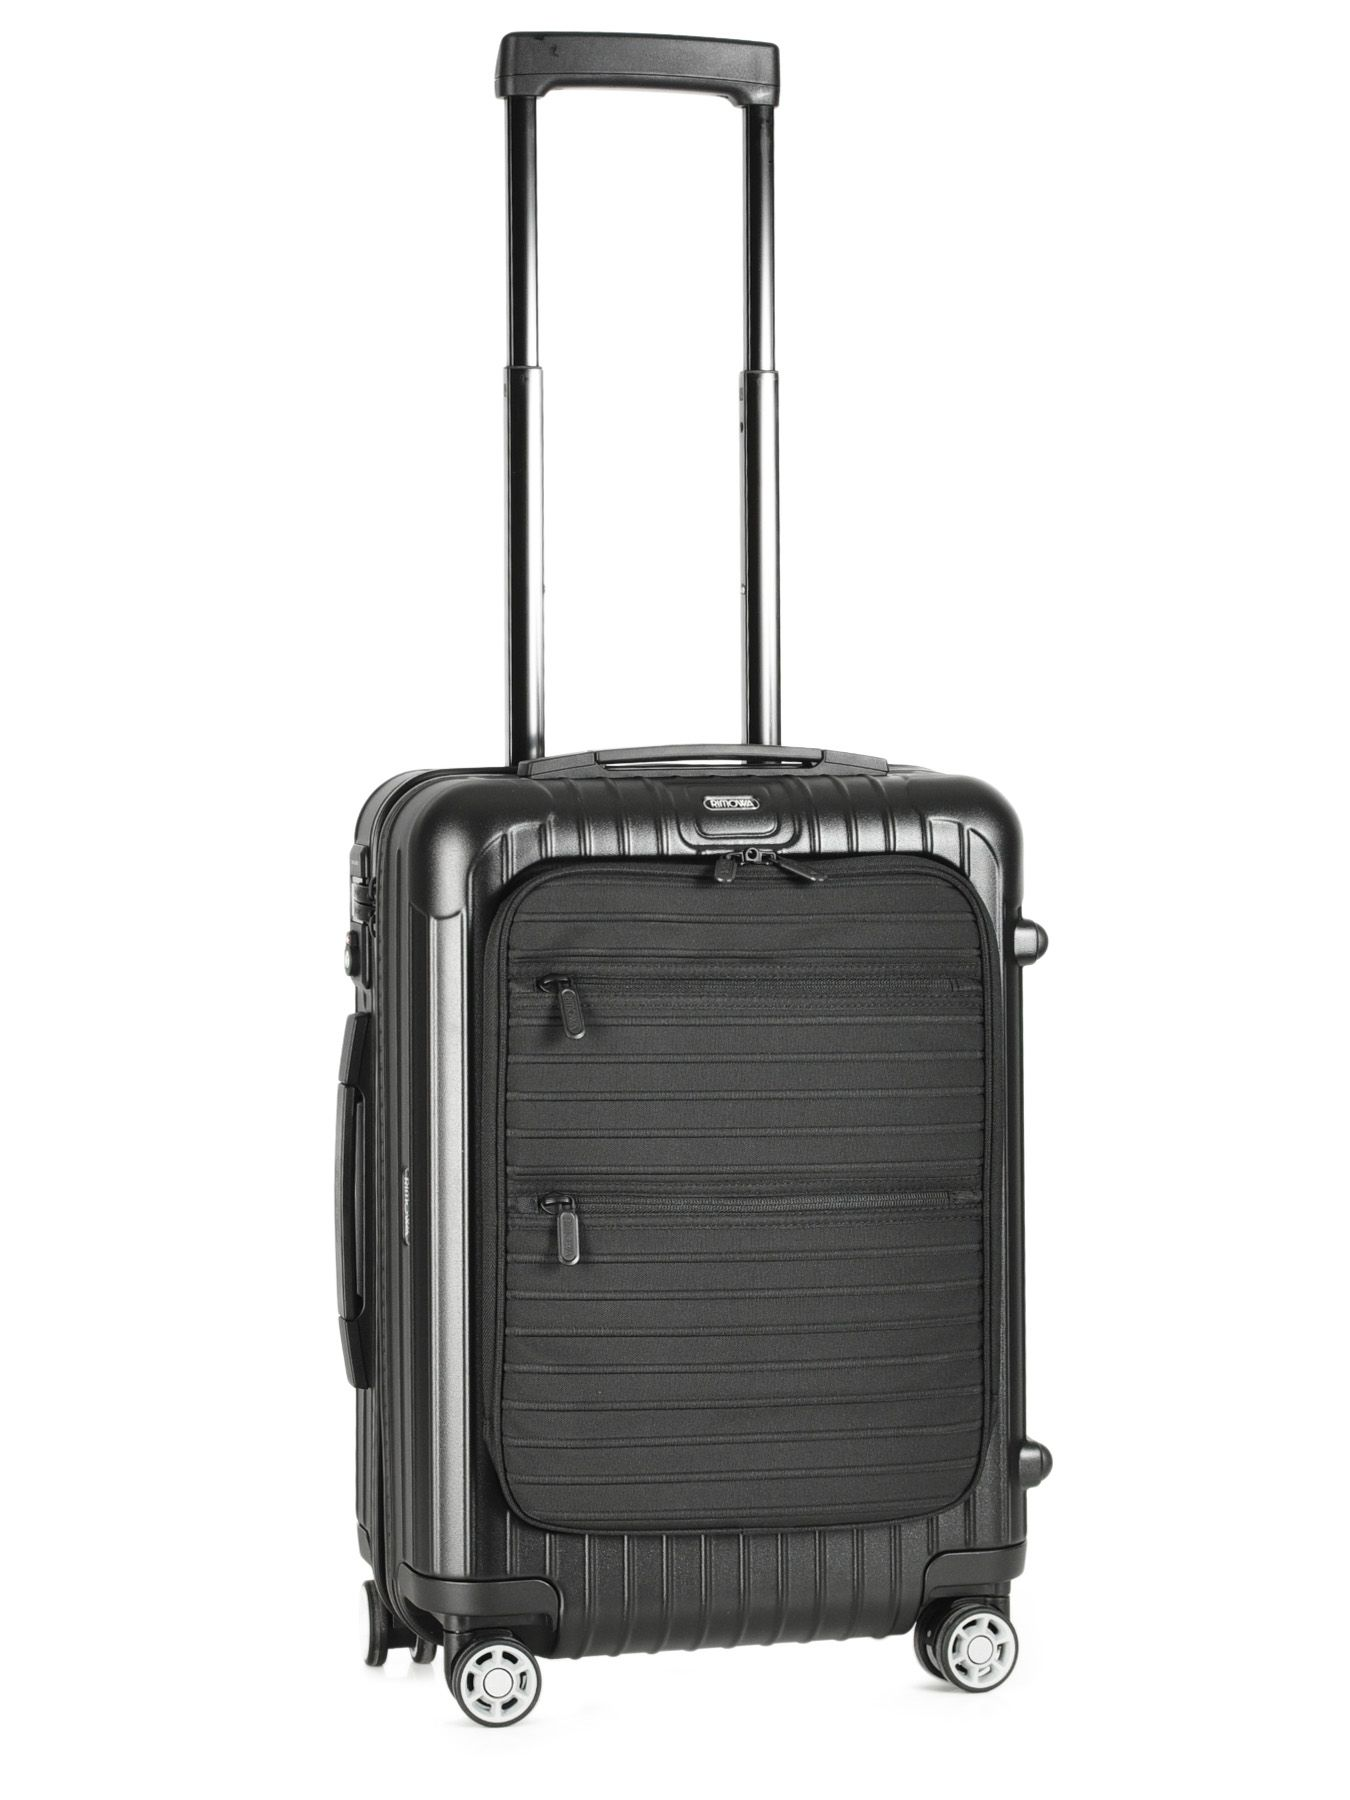 valise cabine rimowa bolero black en vente au meilleur prix. Black Bedroom Furniture Sets. Home Design Ideas